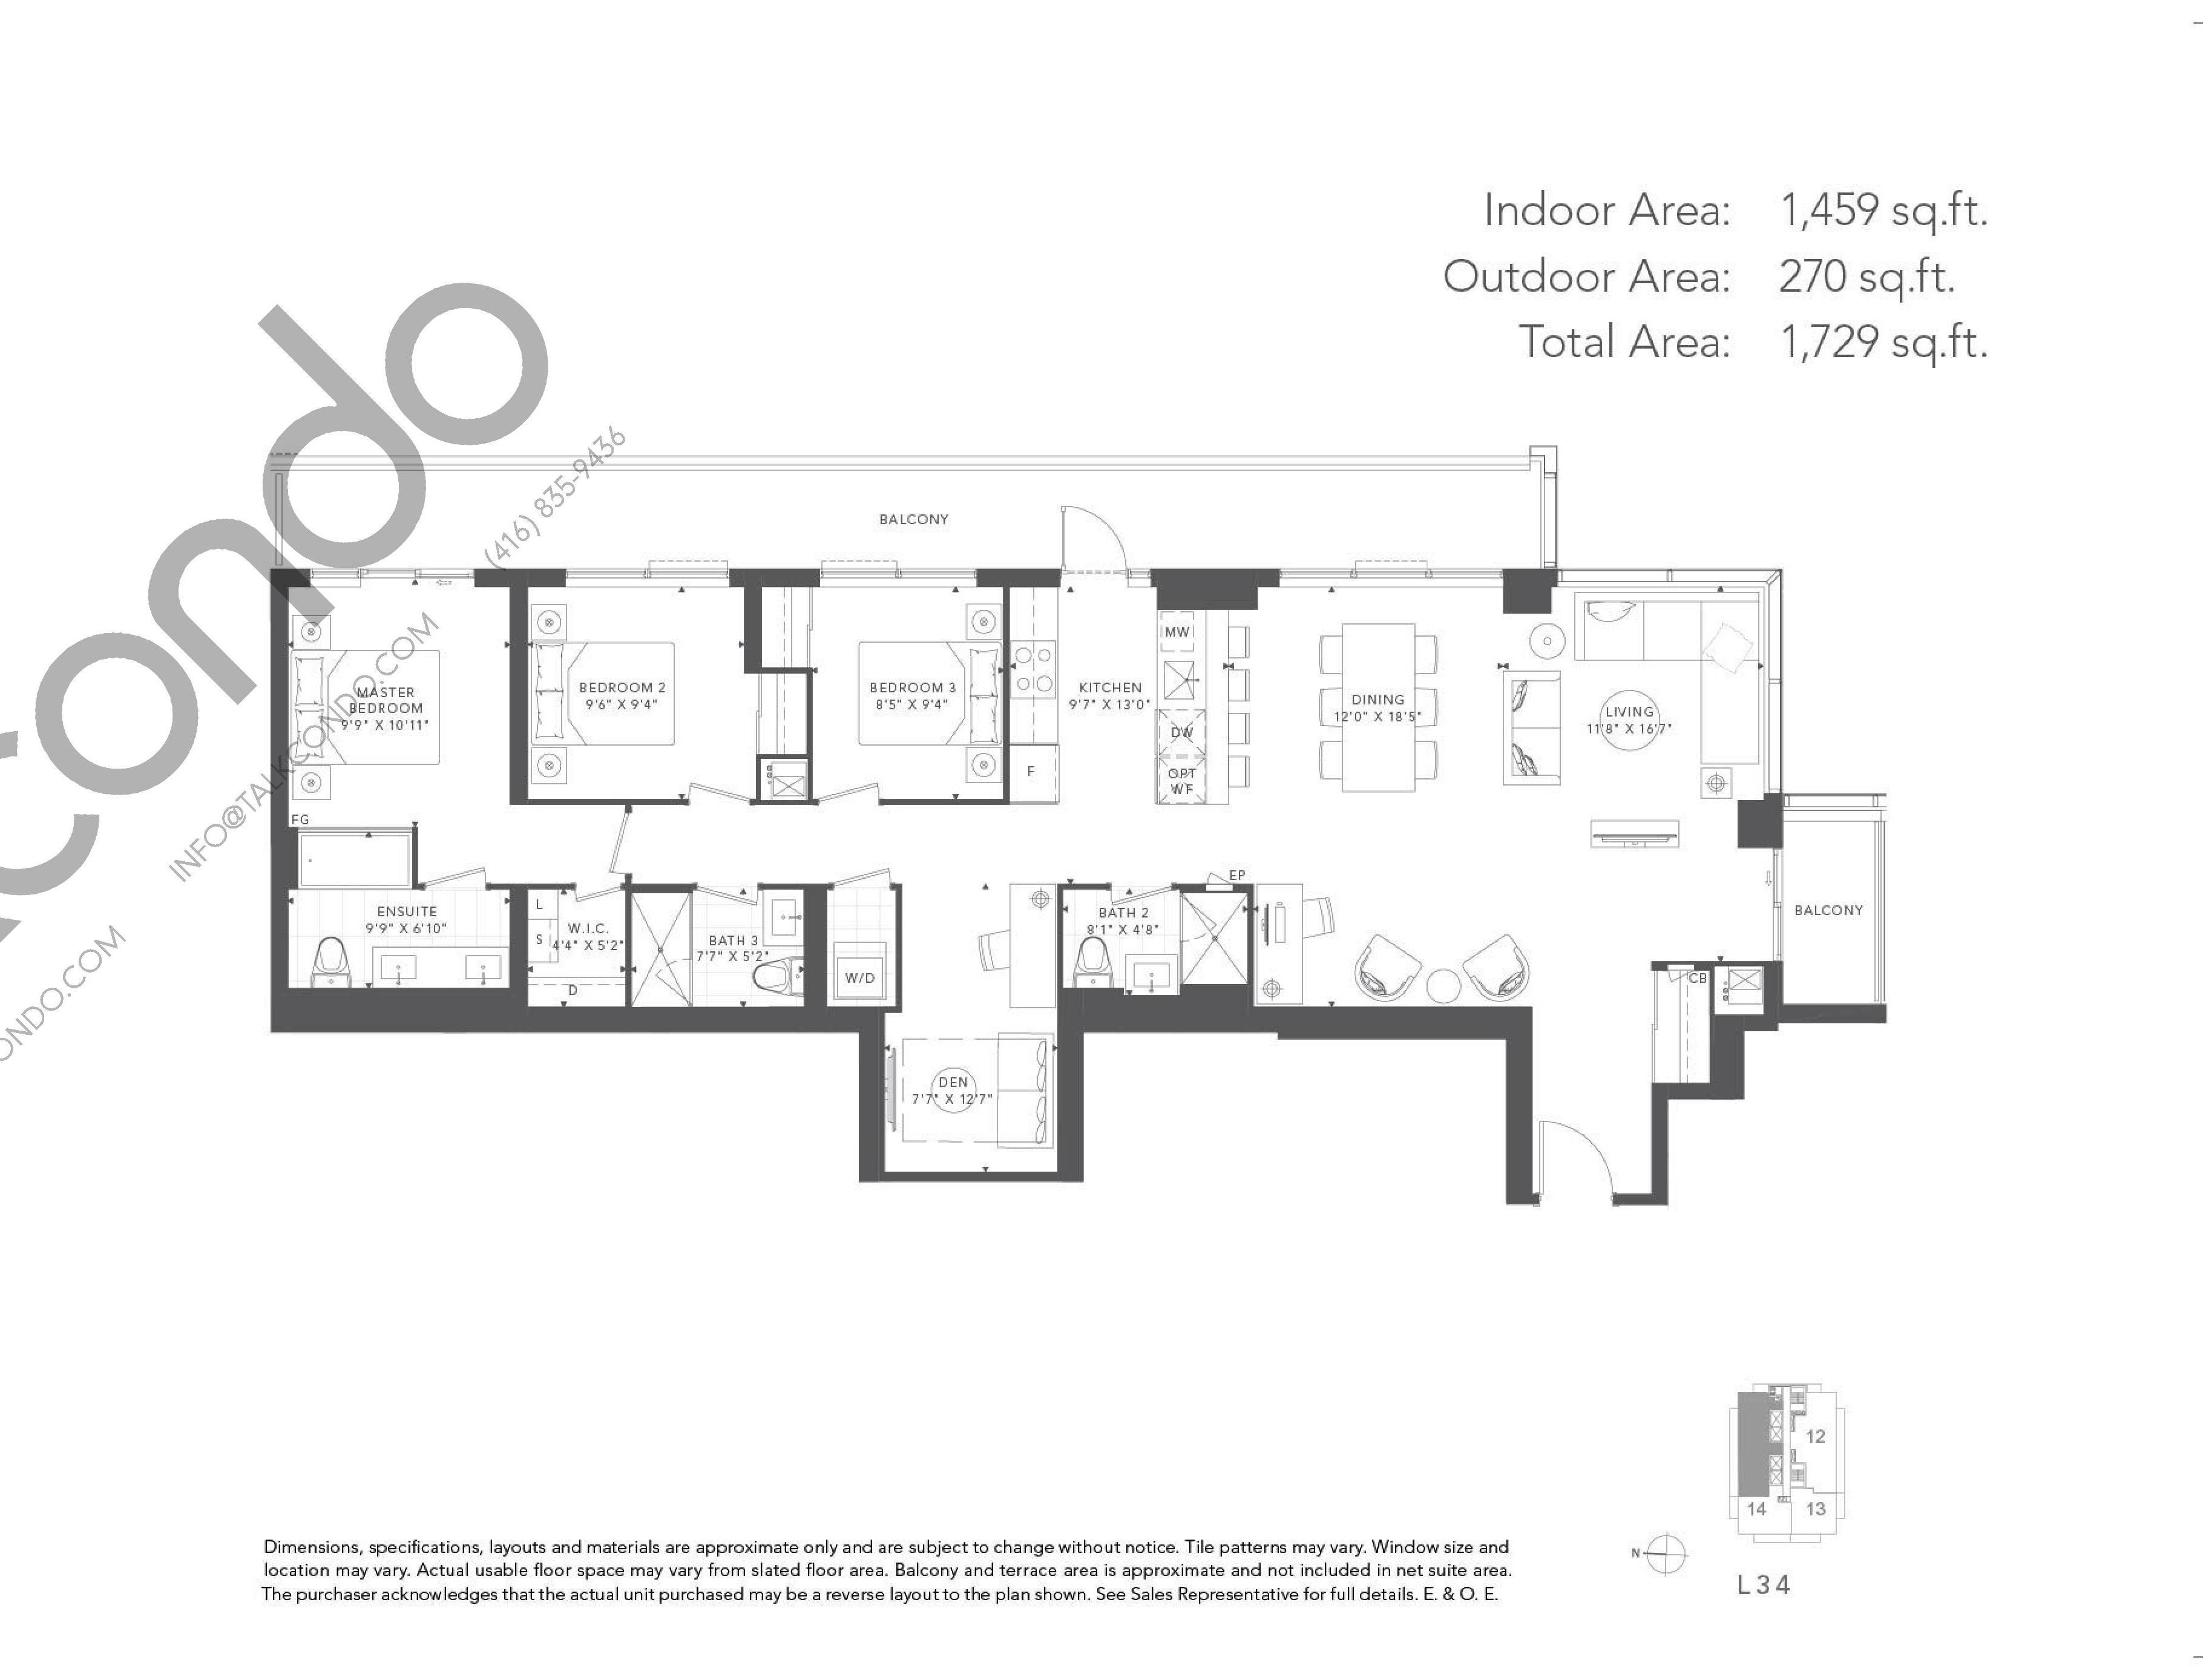 Walnut Floor Plan at T1 at M2M Condos - 1459 sq.ft